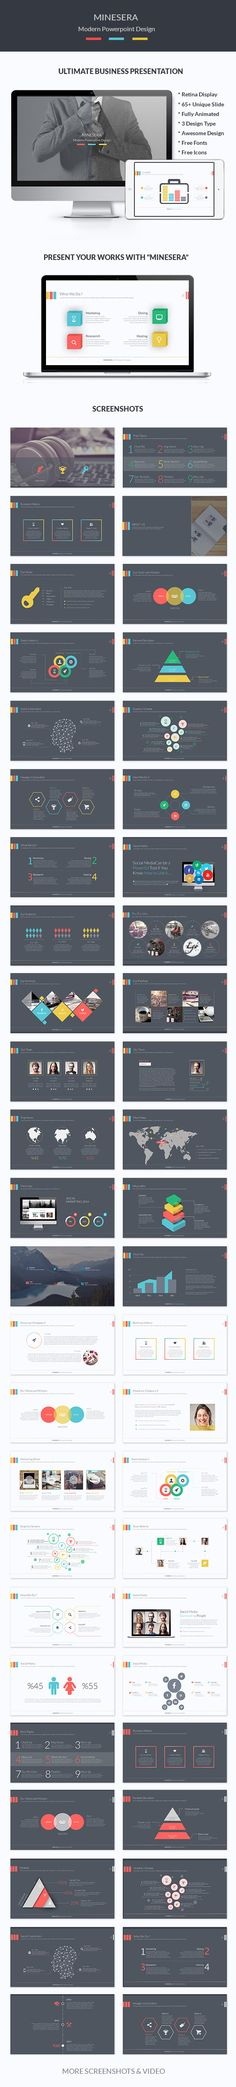 Minesera Business Powerpoint Presentation Template #powerpoint #powerpointtemplate #presentation Download: http://graphicriver.net/item/minesera-business-powerpoint-presentation/9690677?ref=ksioks